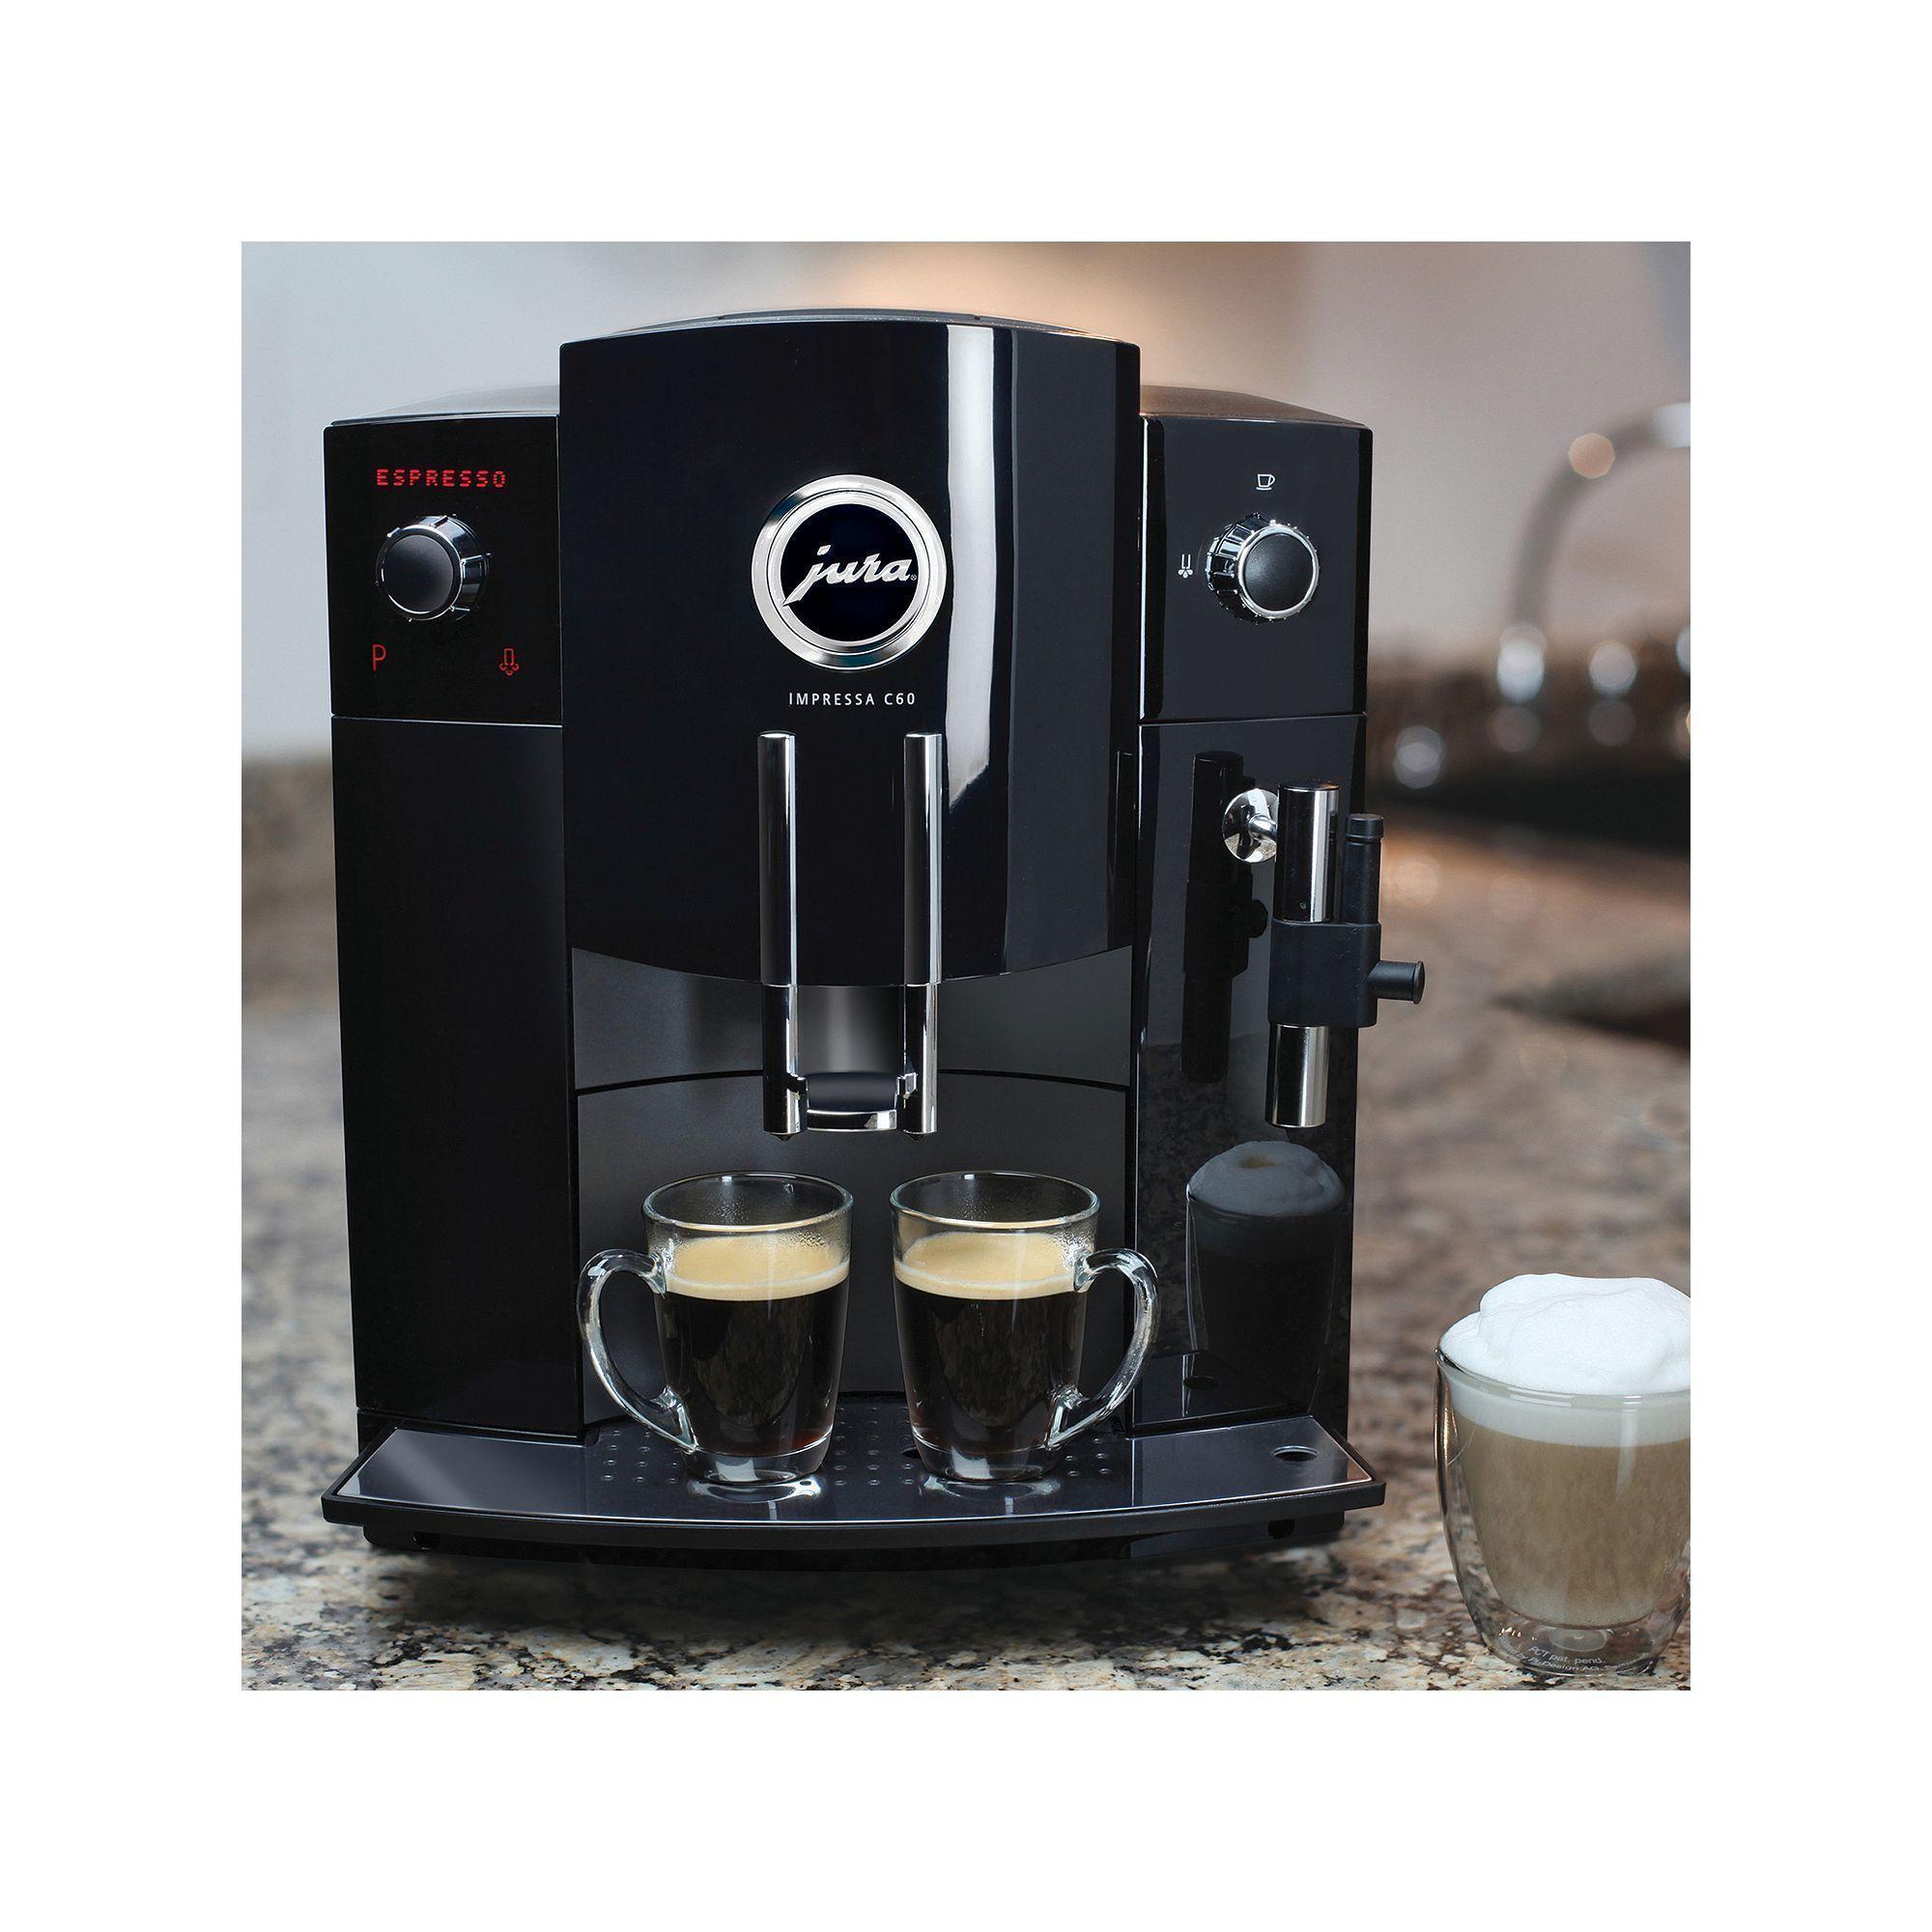 Jura Impressa C60 Espresso Machine #juraimpressa Jura